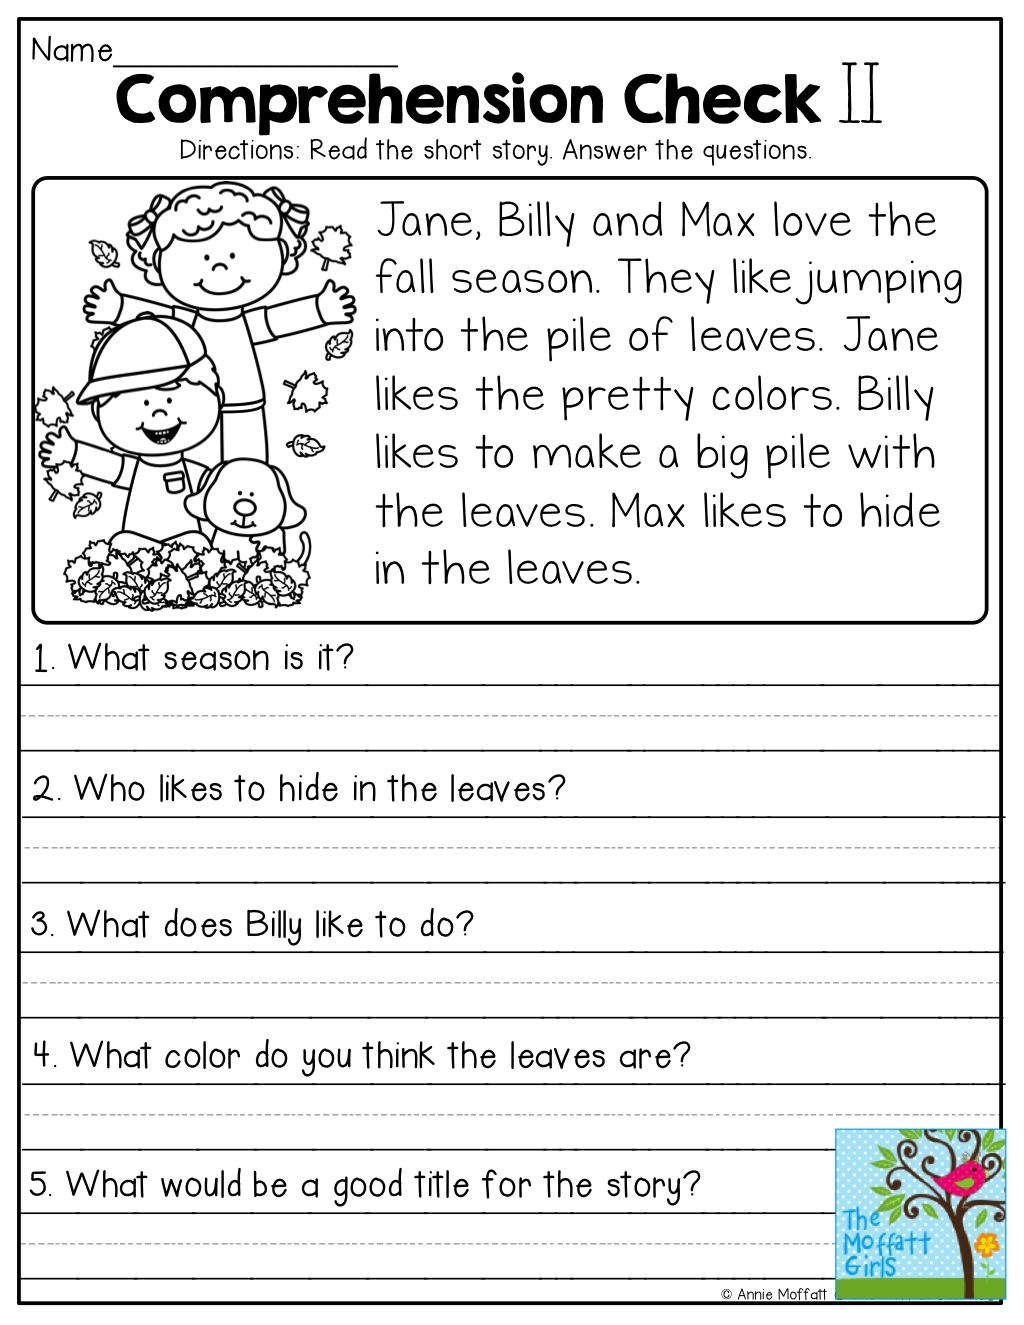 Comprehension Checks And So Many More Useful Printables | 1St Grade Reading Comprehension Worksheets Printable